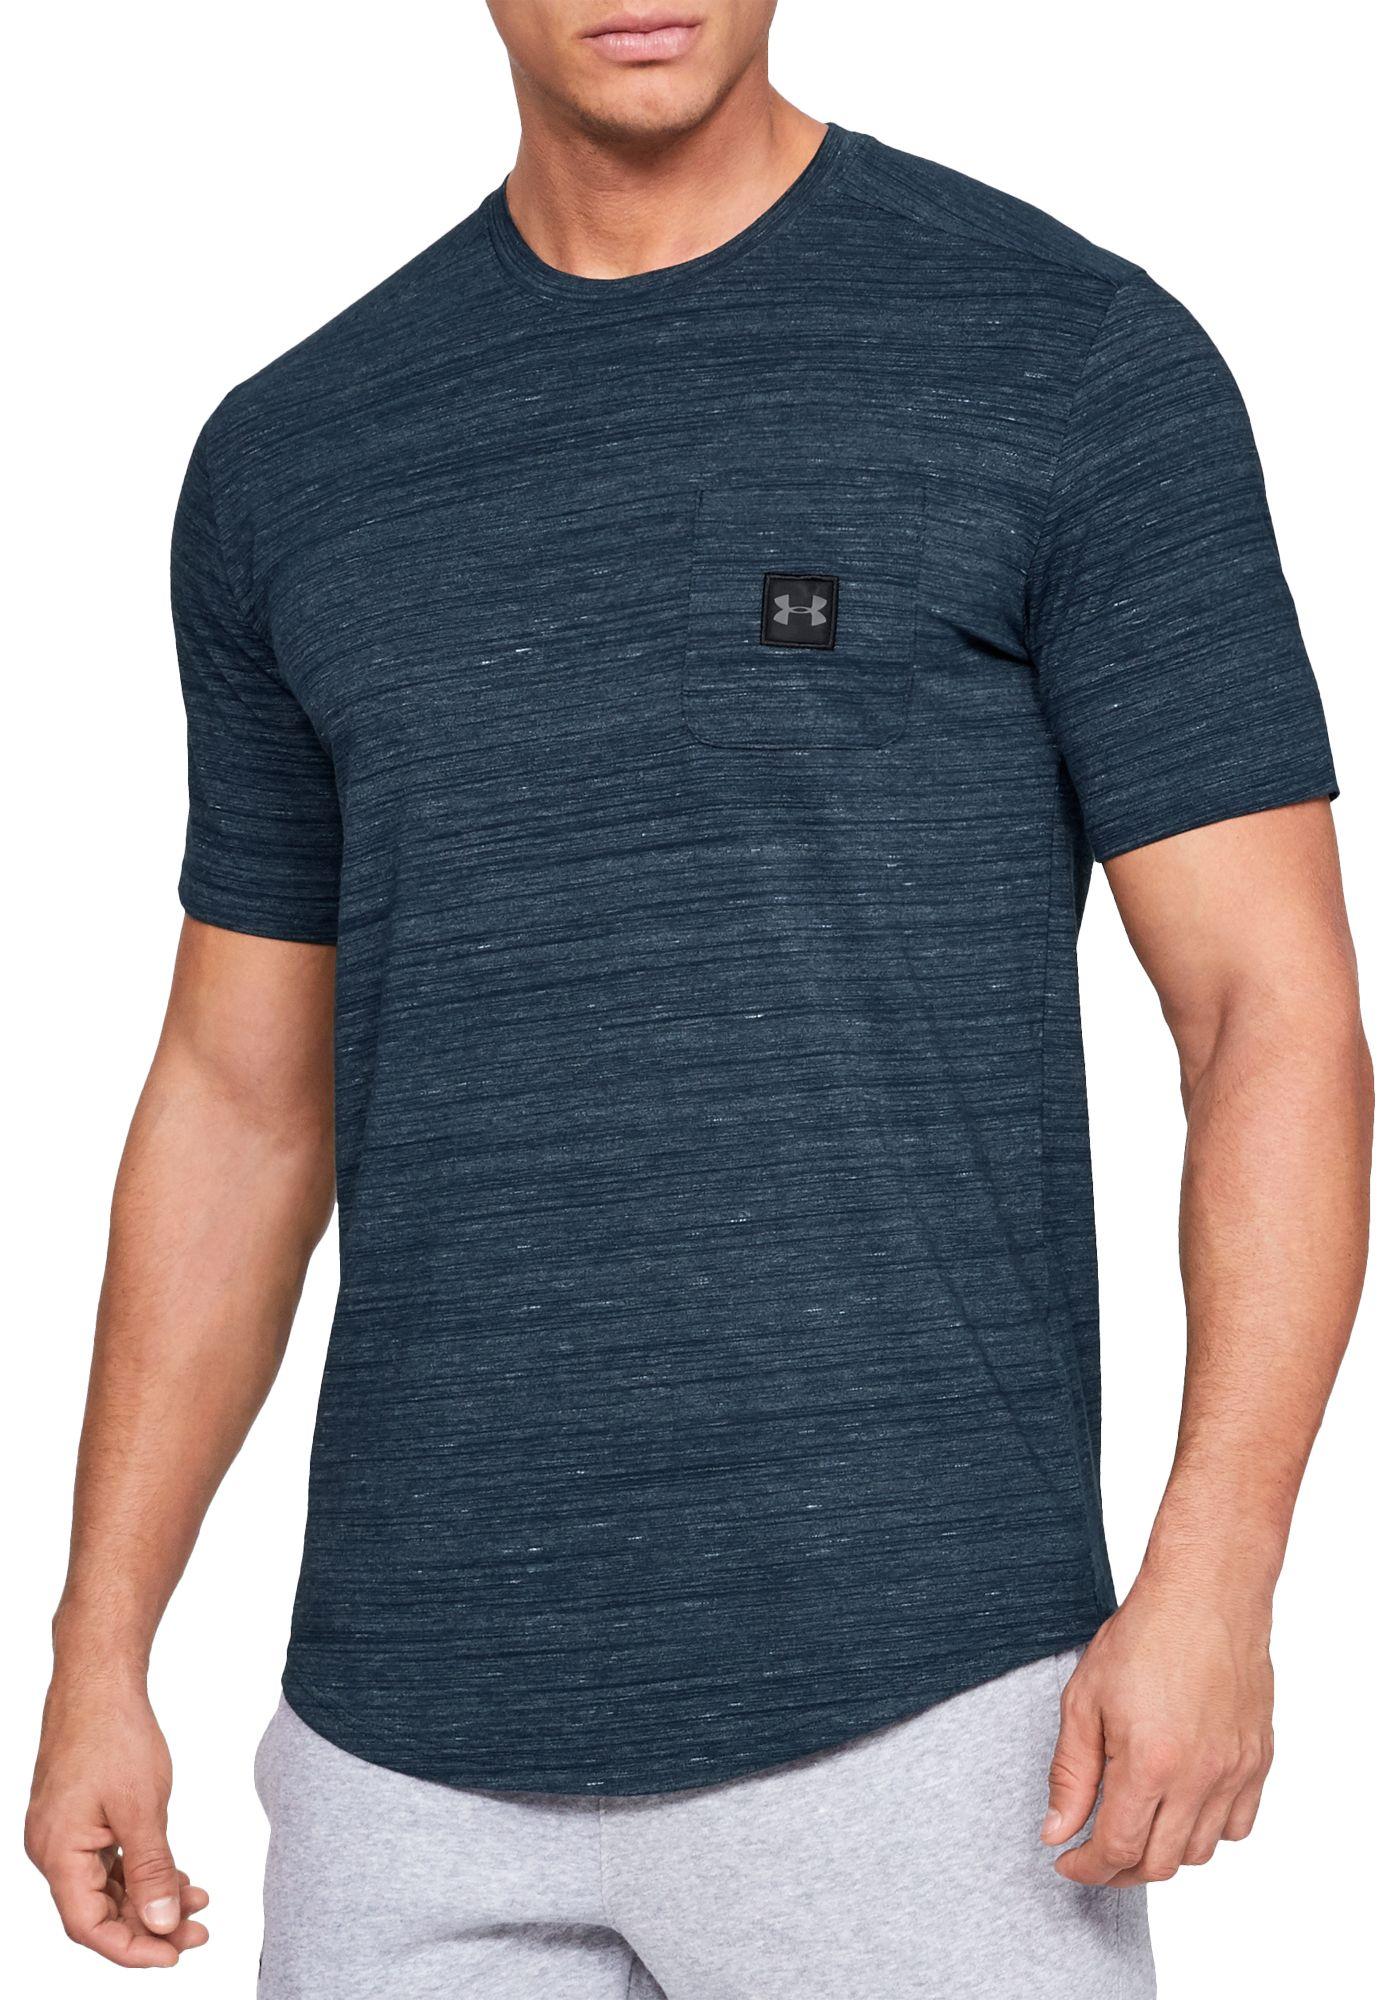 Under Armour Men's Sportstyle Pocket T-Shirt